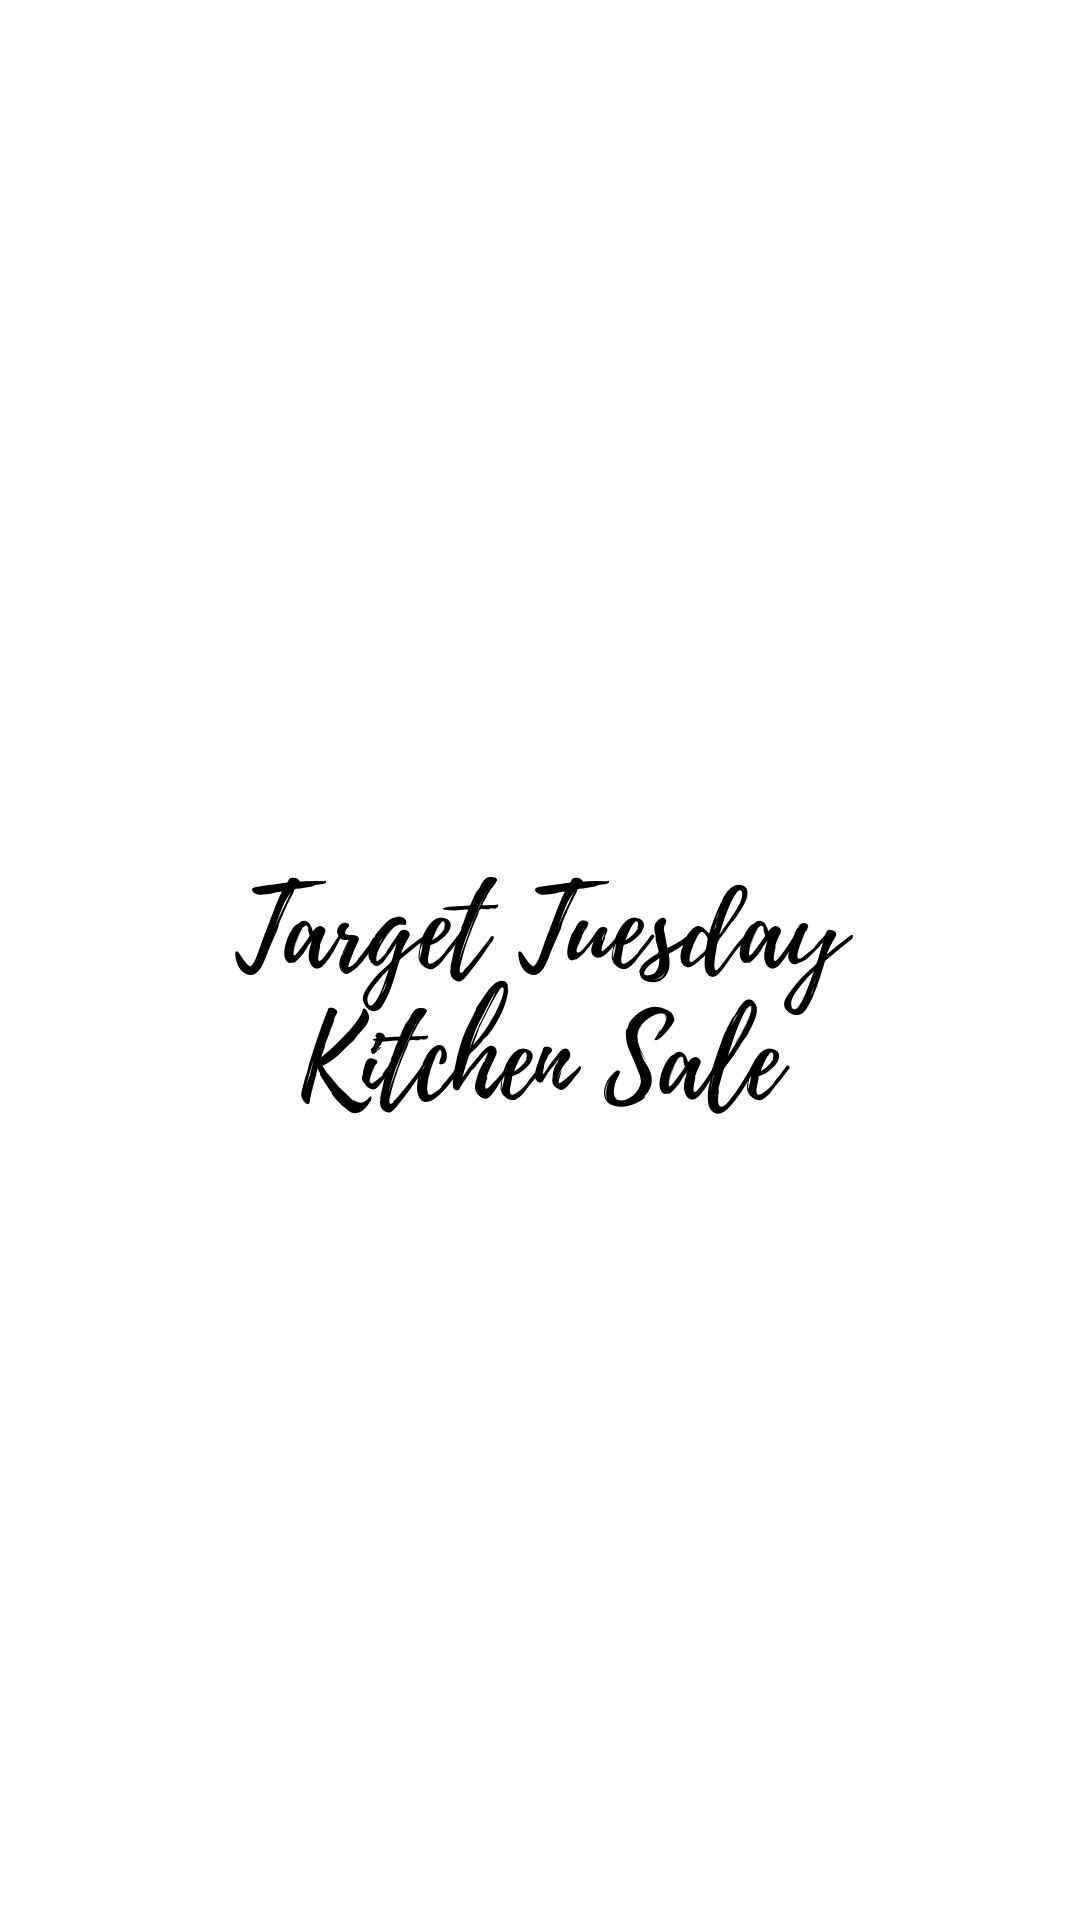 target tuesday kitchen sale sarah bowmar